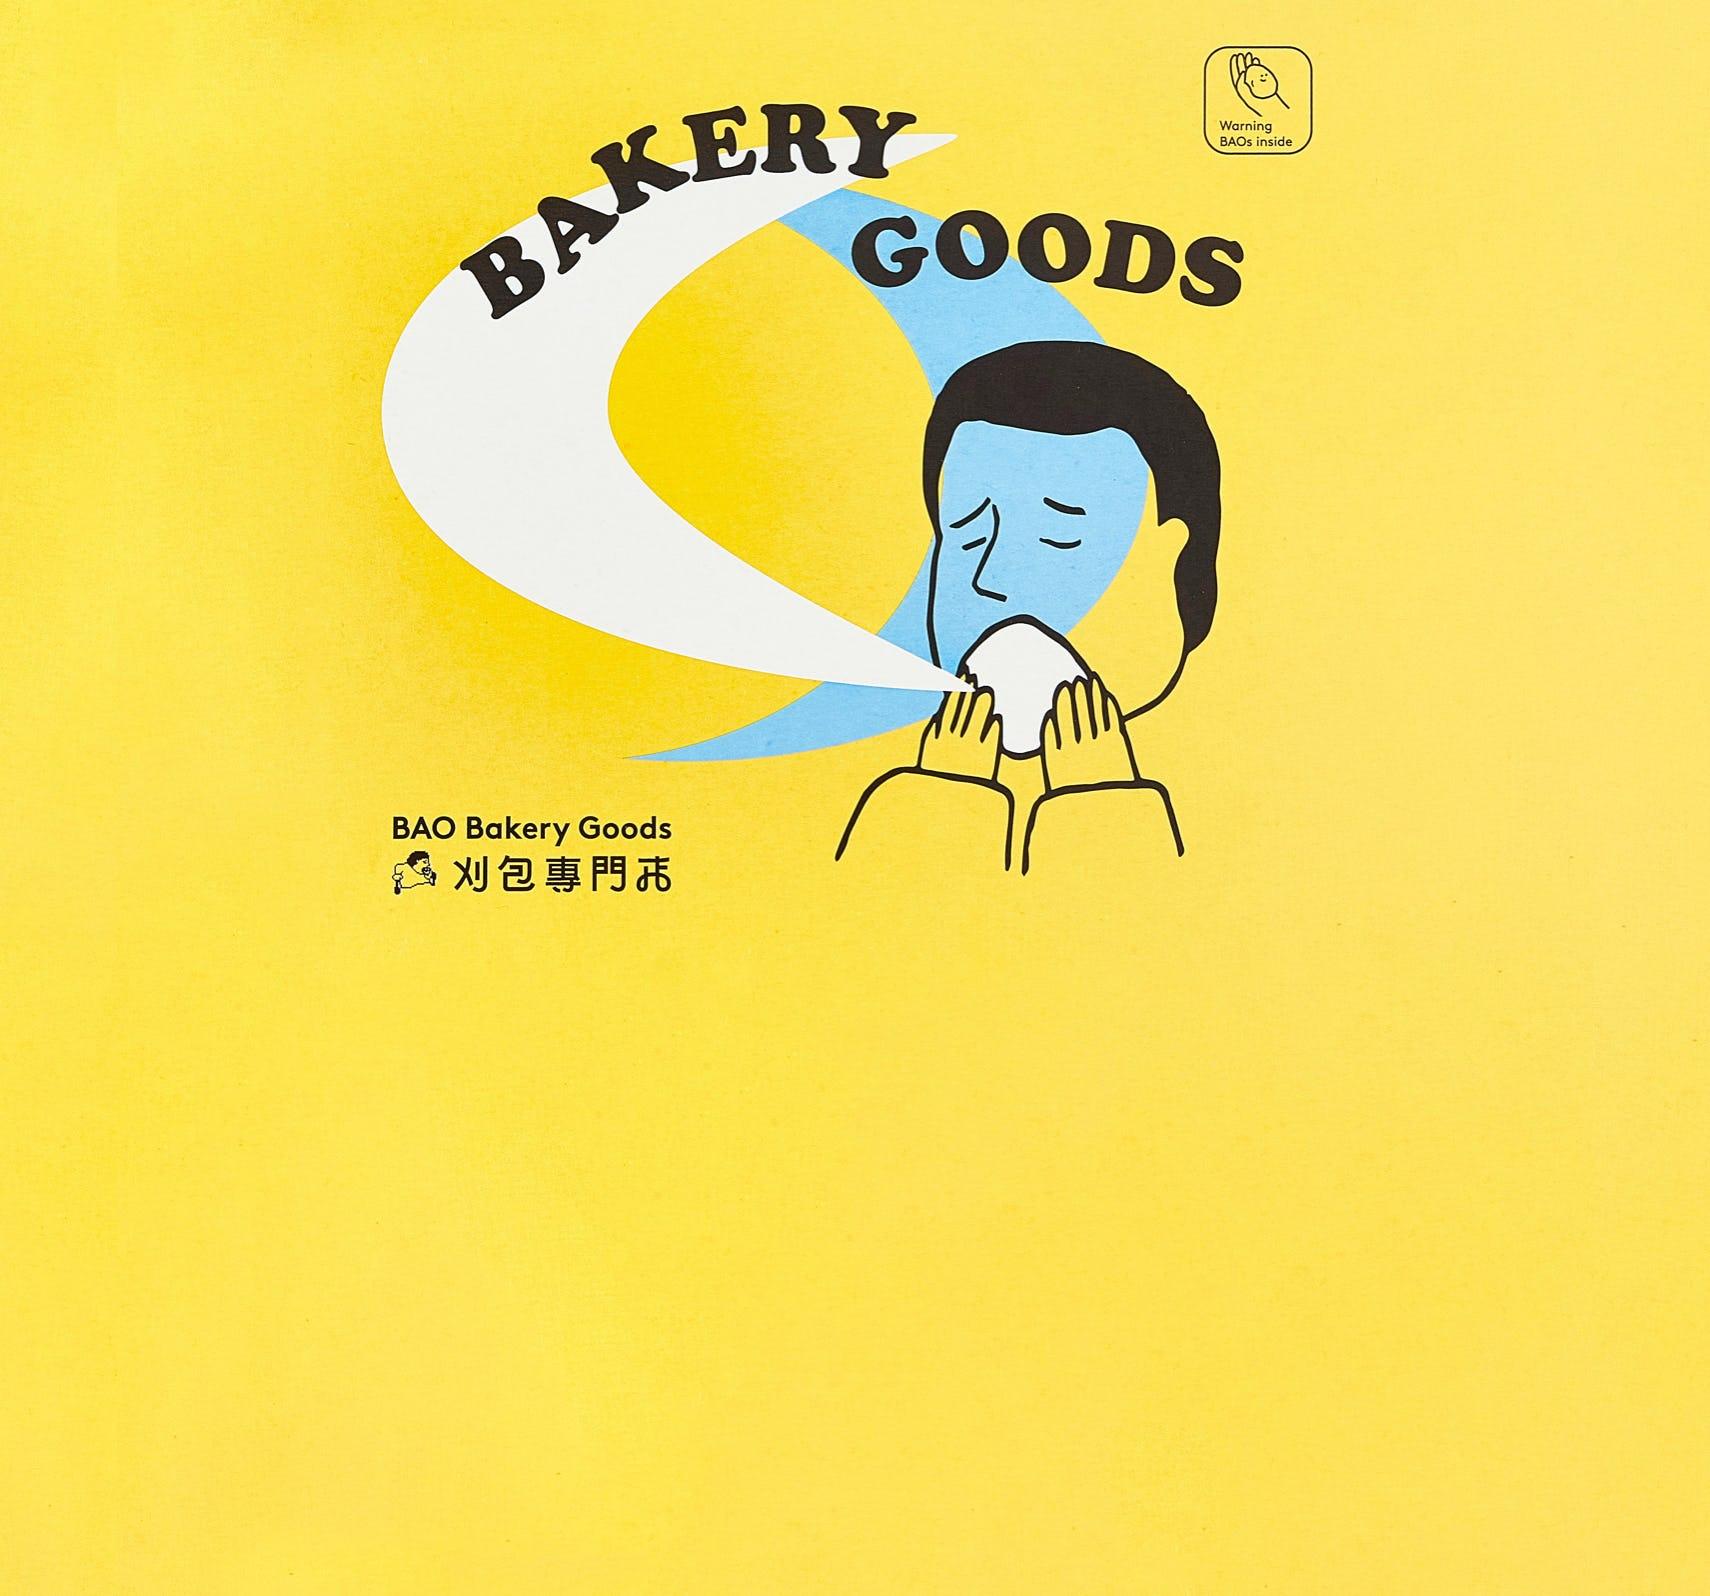 BAO Bakery Goods